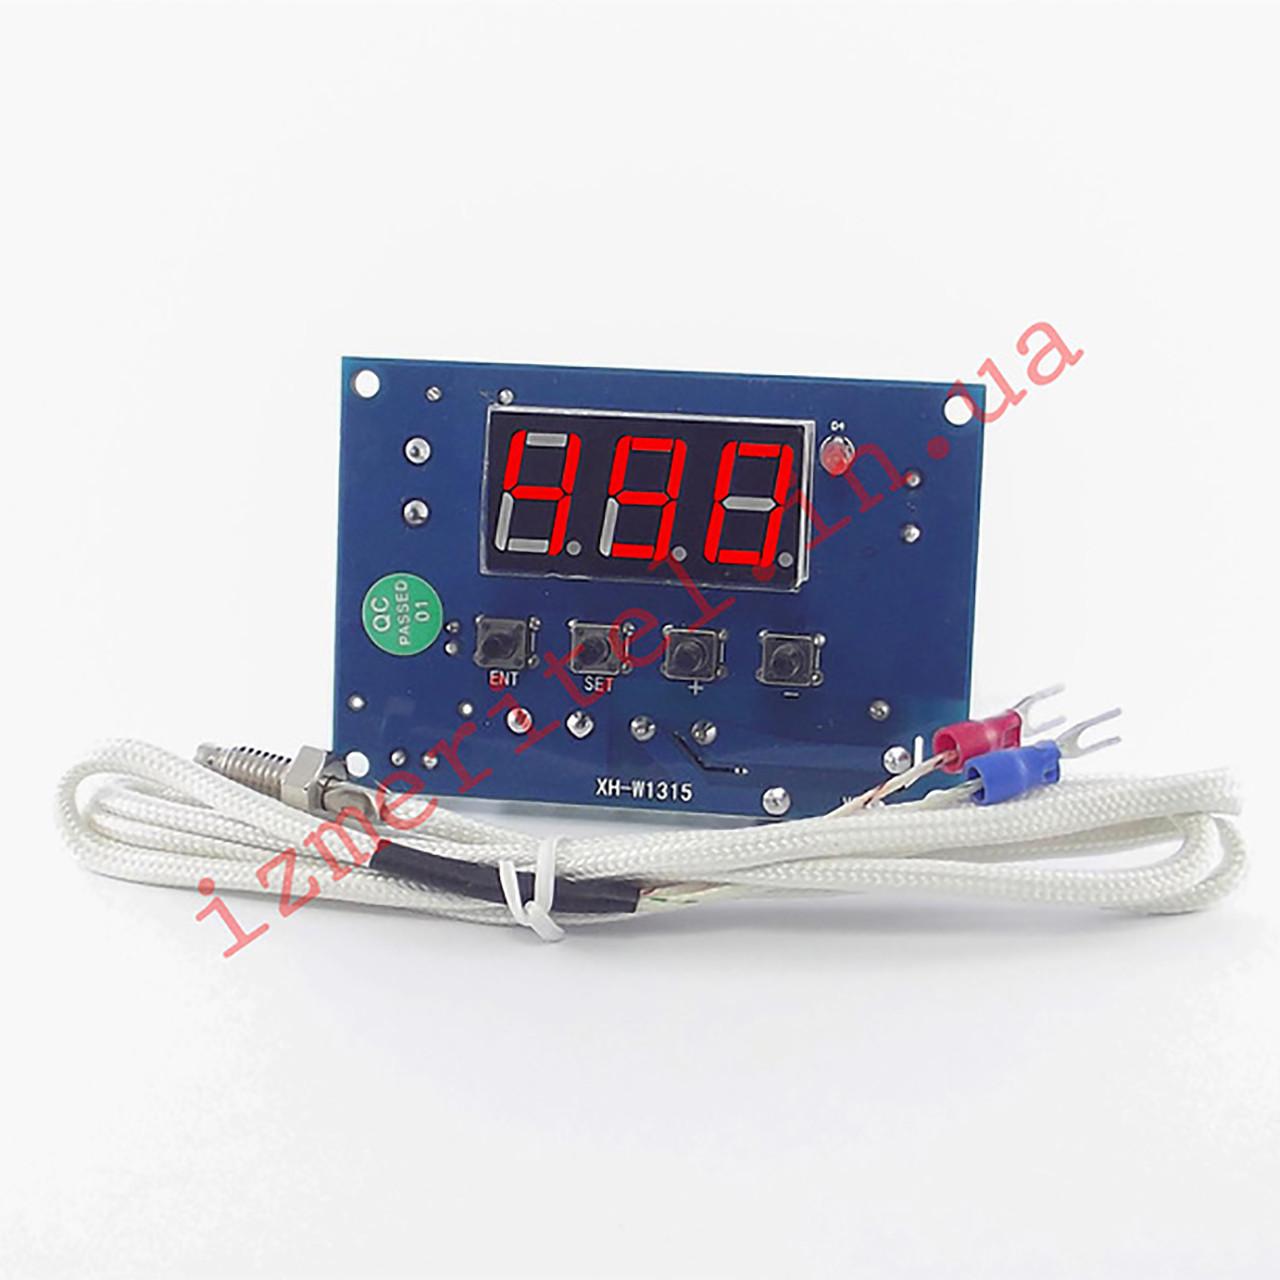 Высокотемпературный терморегулятор W1315 24v